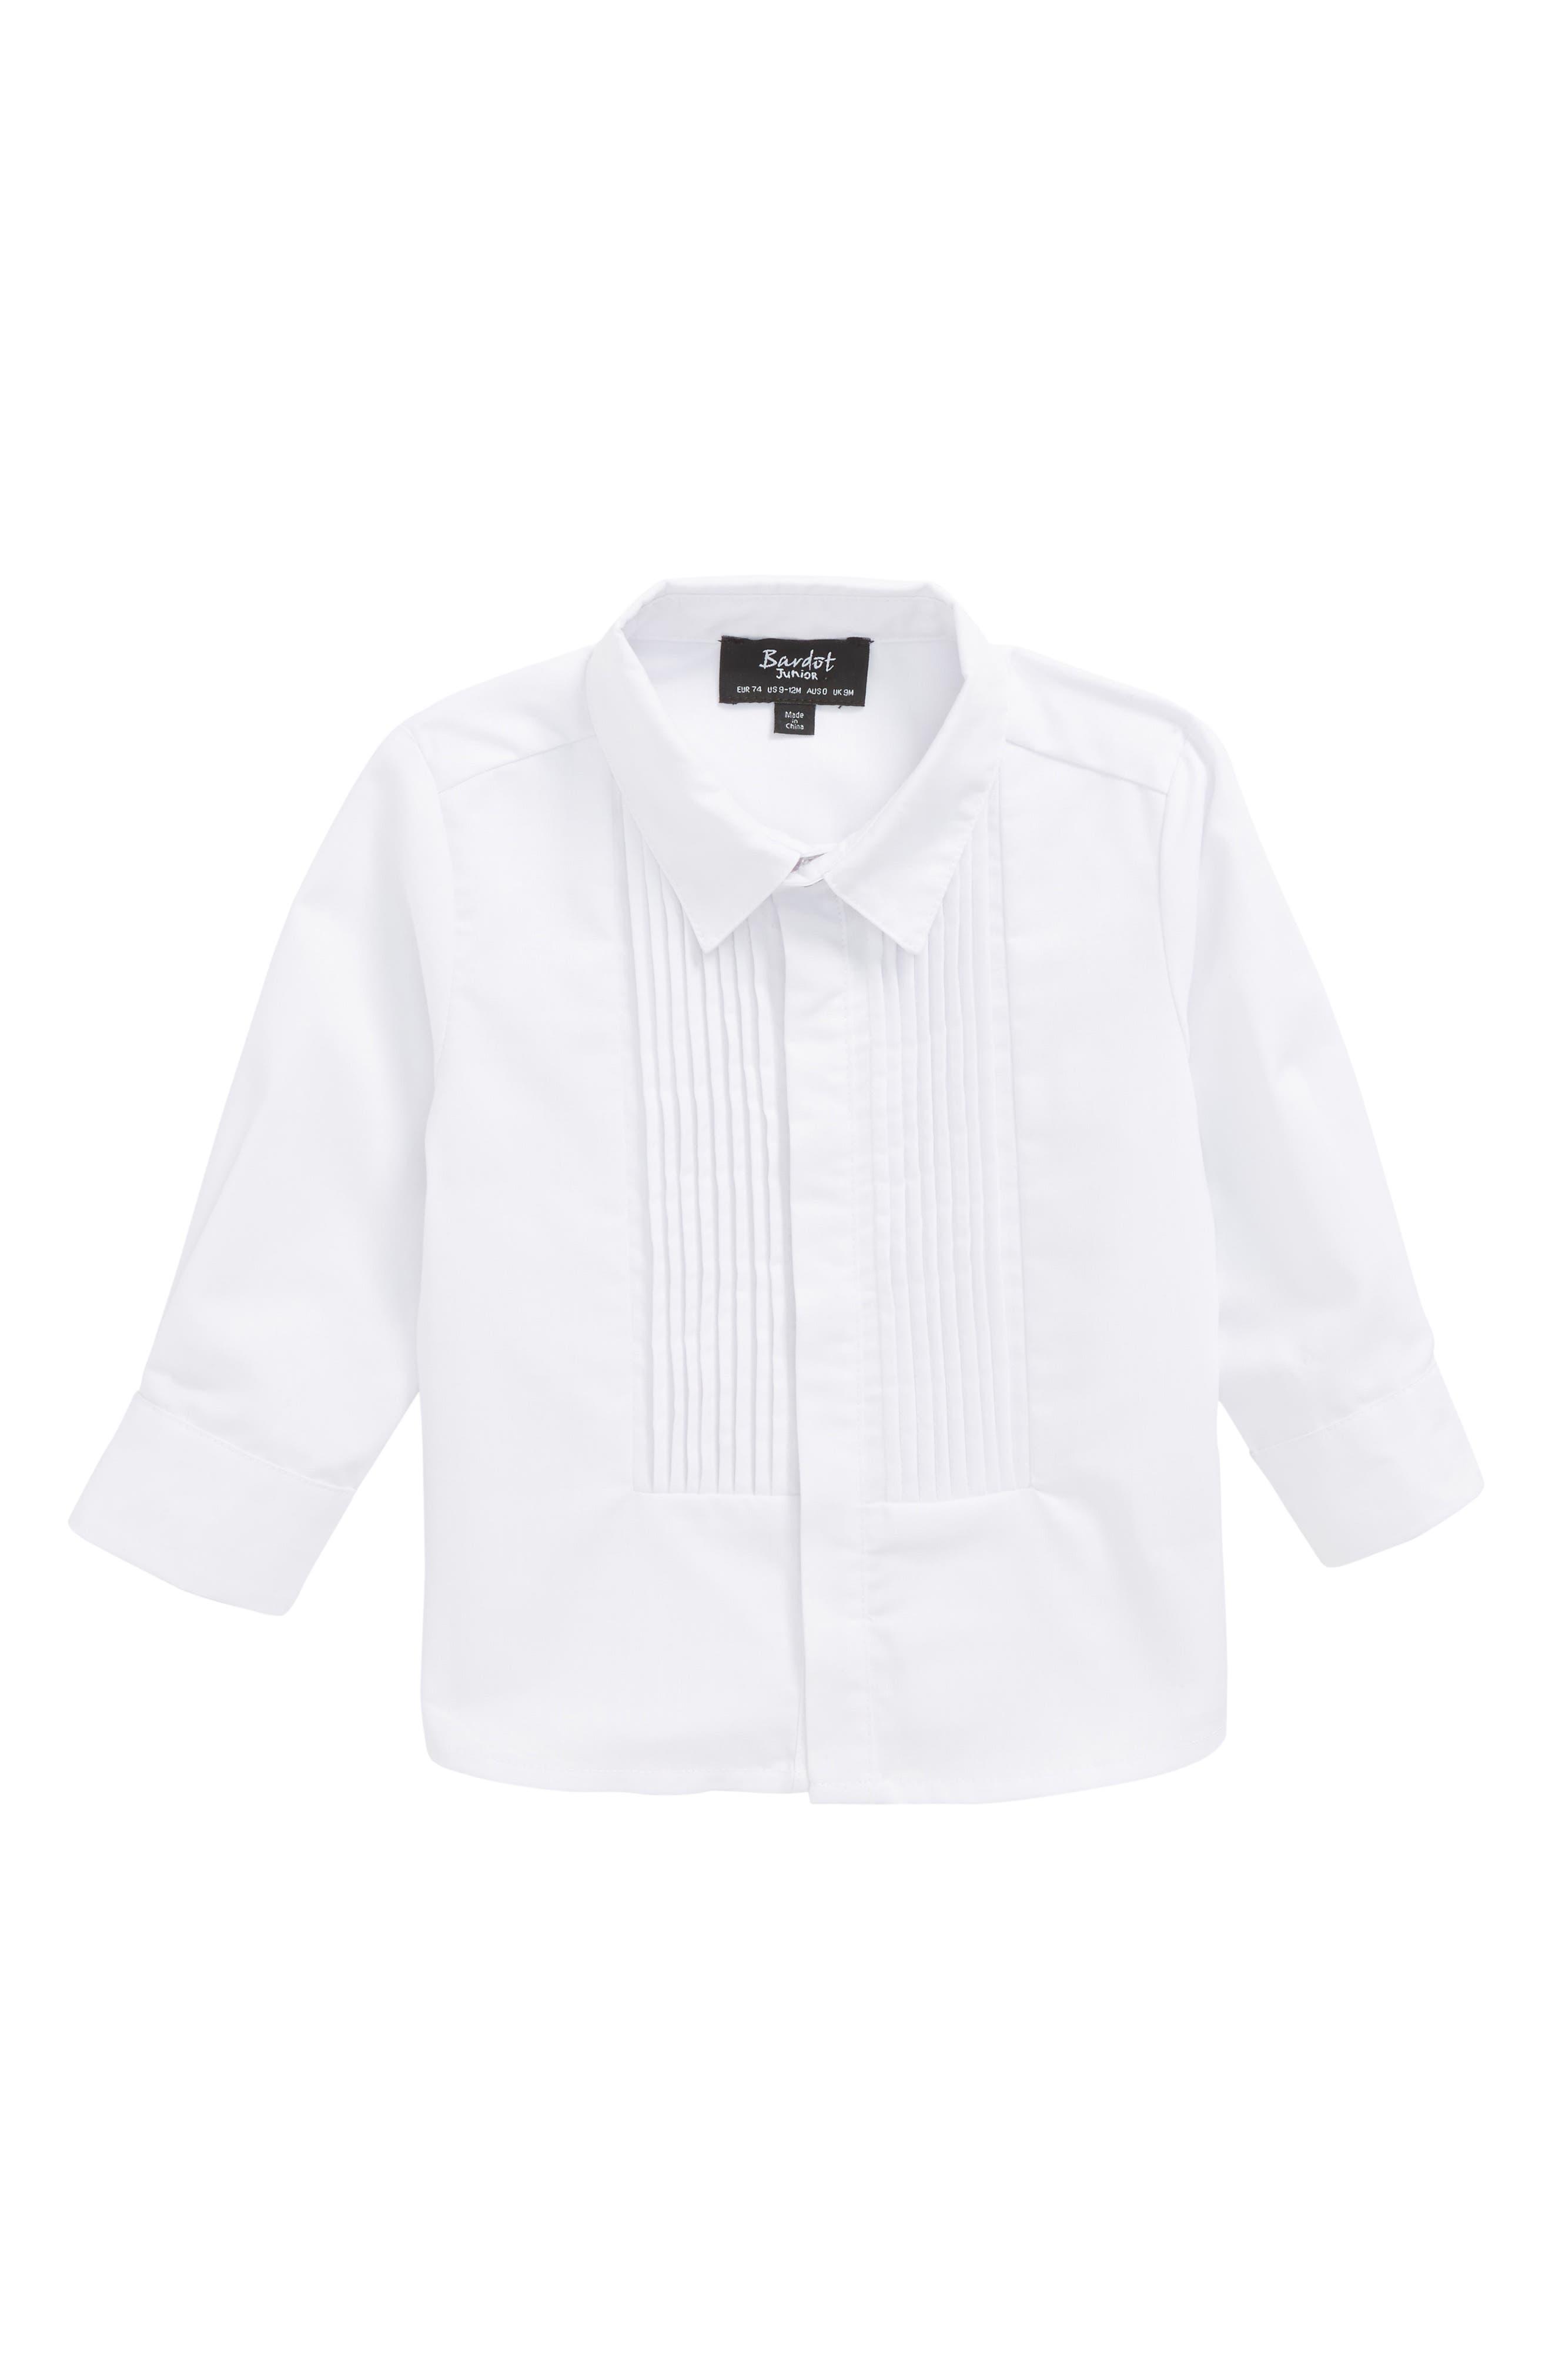 Tuxedo Shirt,                             Main thumbnail 1, color,